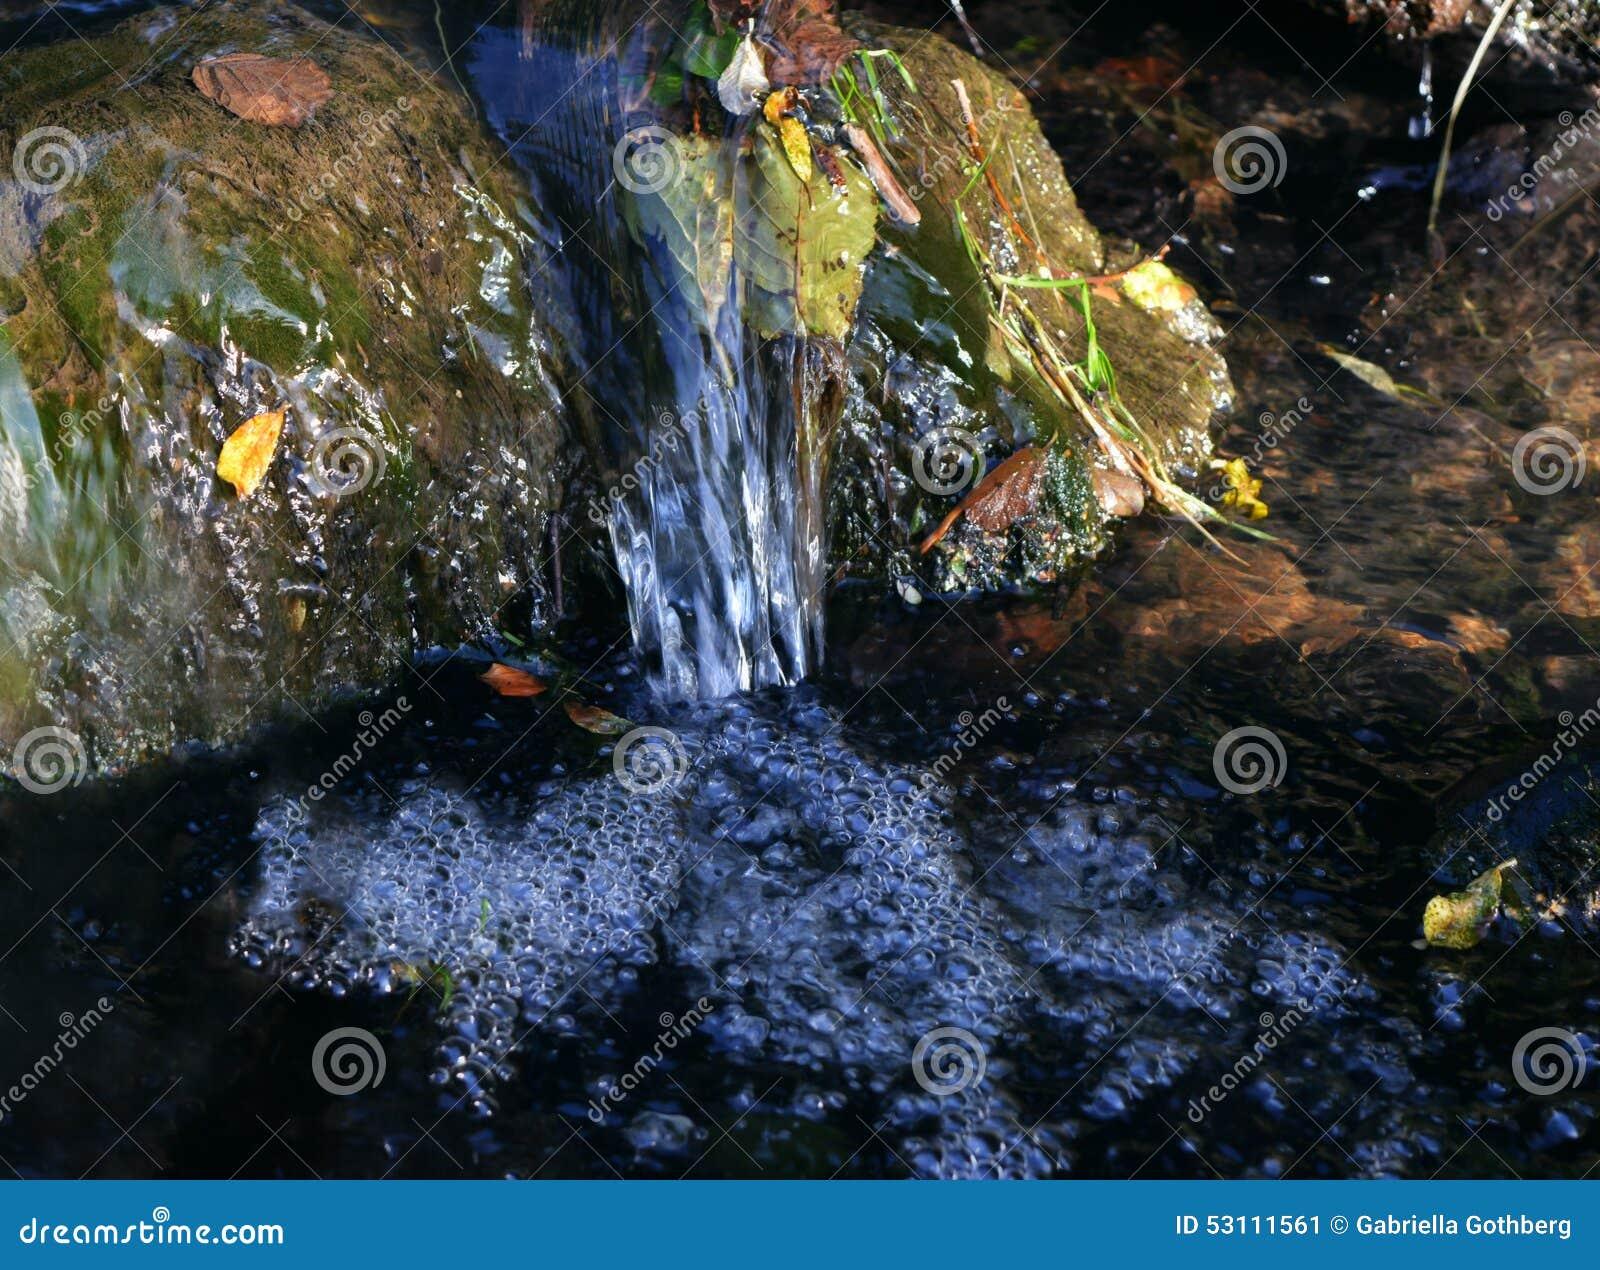 Rippling spring creek